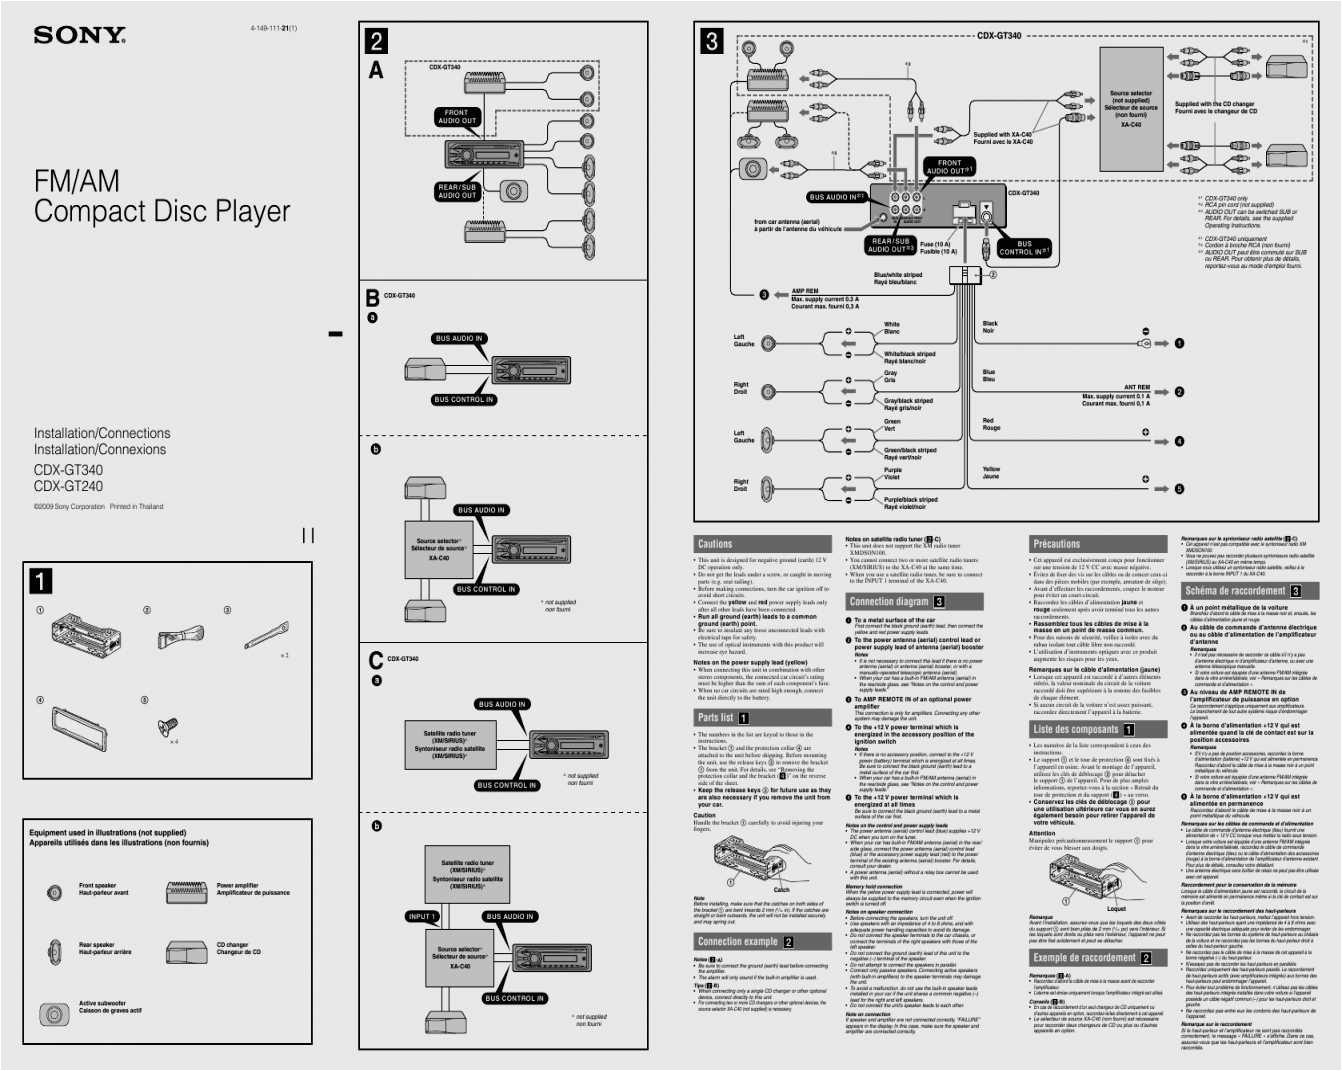 sony cdx gt410u wiring diagram sony xplod radio wiring diagram sony cdx wiring diagram for radio of sony cdx gt410u wiring diagram png